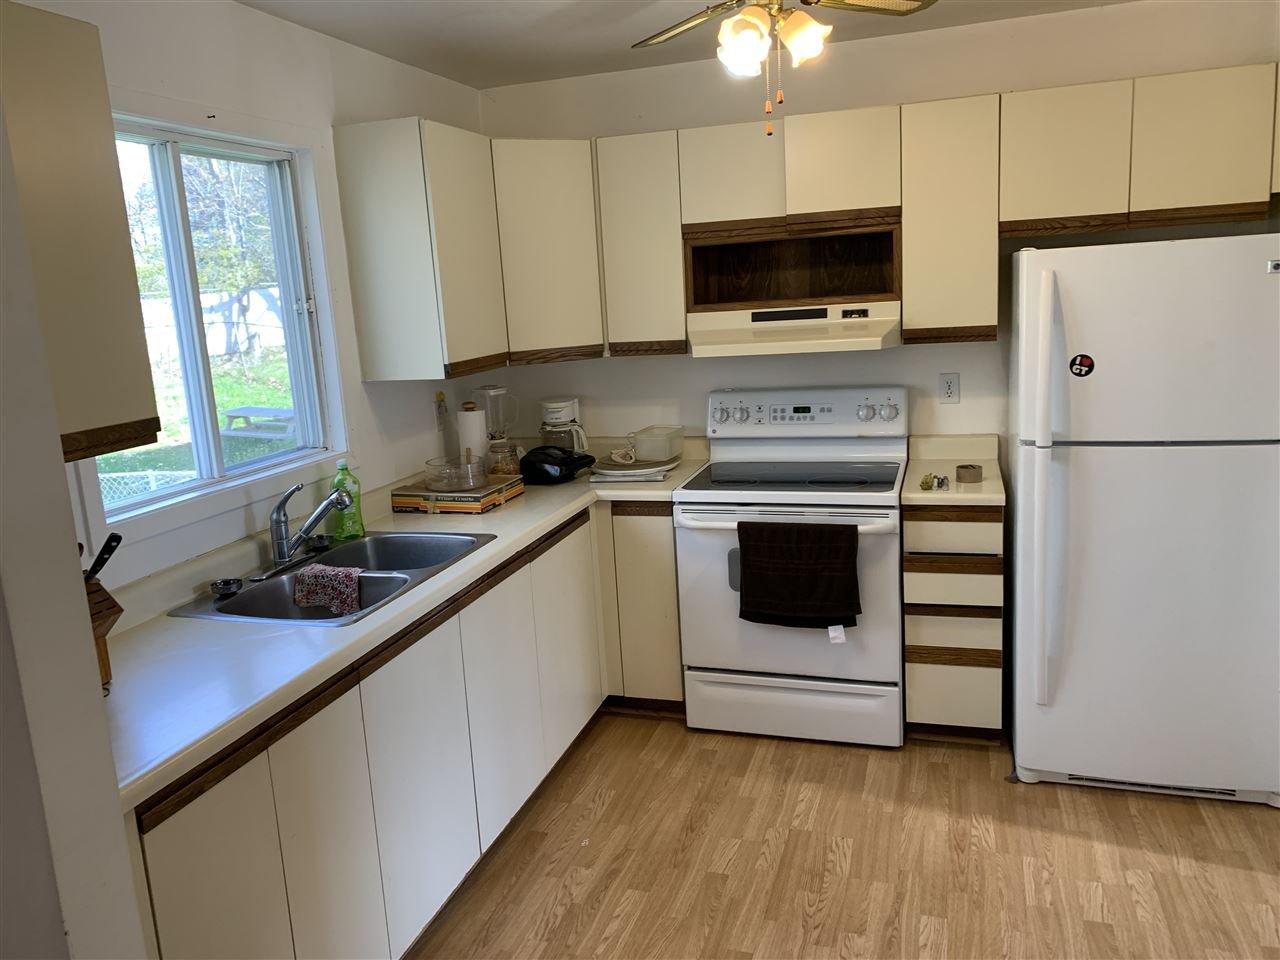 Photo 2: Photos: 8 Emily Court in Lower Sackville: 25-Sackville Residential for sale (Halifax-Dartmouth)  : MLS®# 202008626